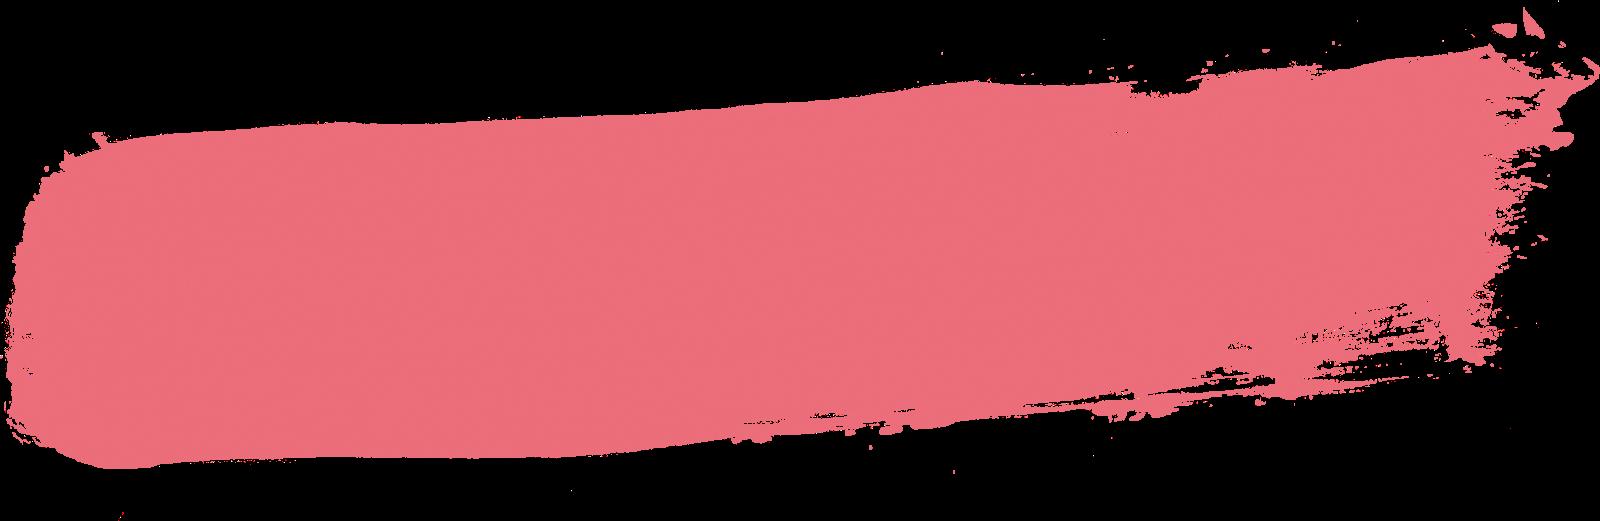 Sb Brush Stroke Pink Png 1600 521 Brush Strokes Painting